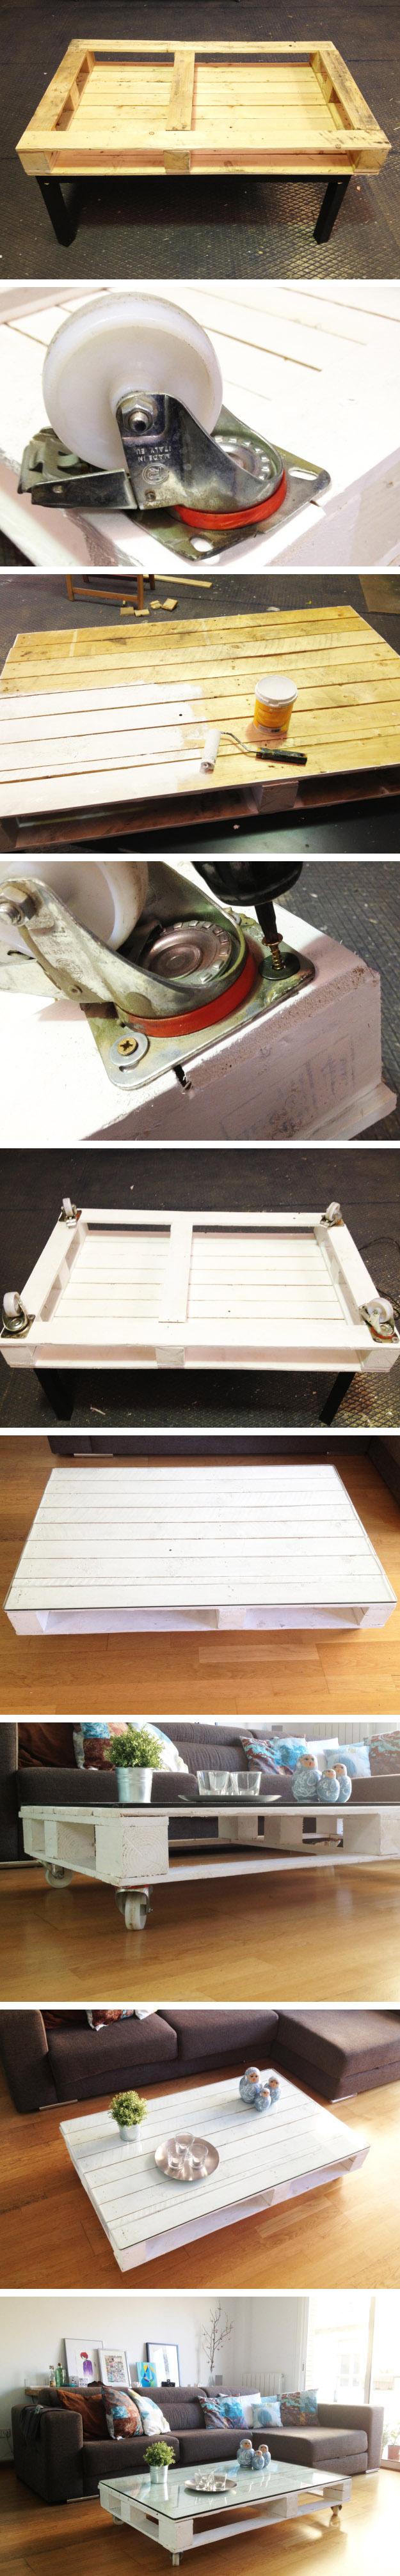 pale-pallet-reciclaje-diy-mesa-muy-ingenioso-1.jpg